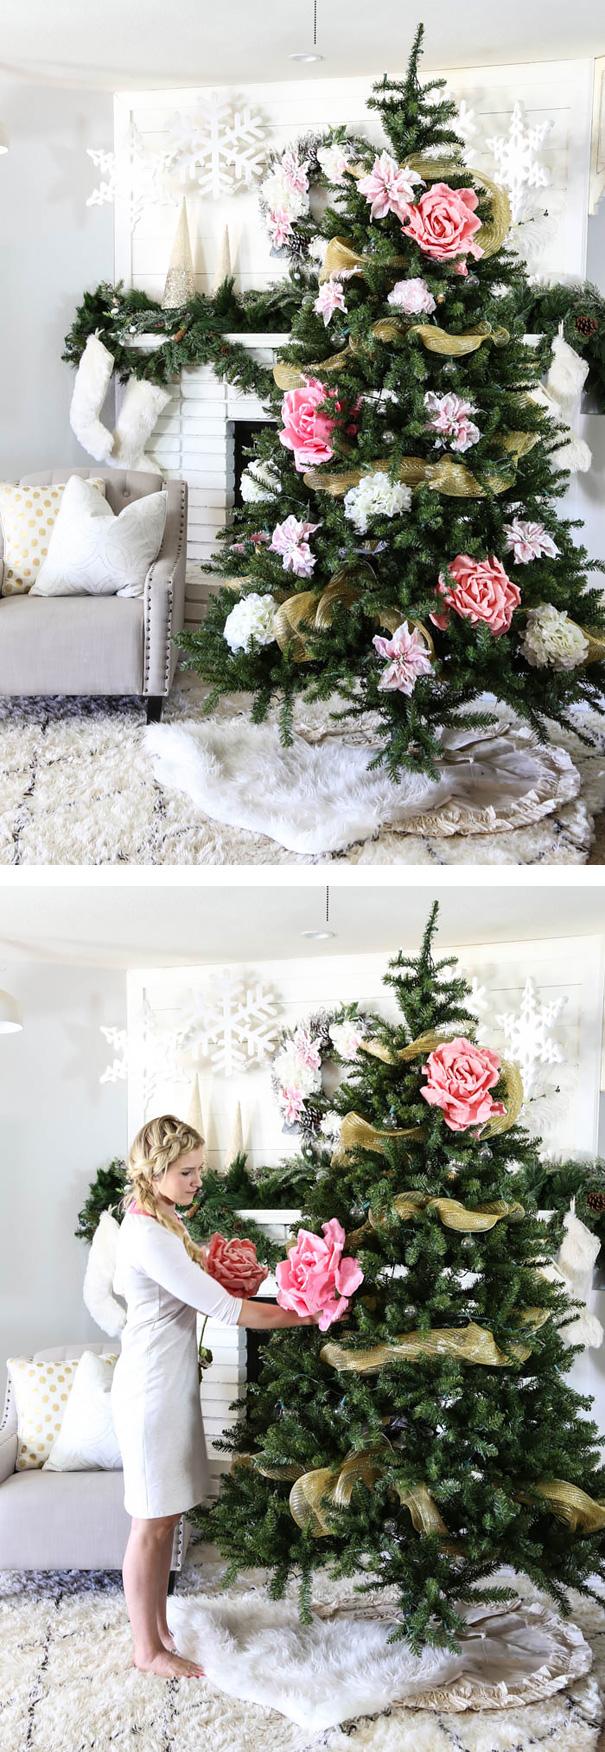 perierga.gr - Άνθισαν τα... χριστουγεννιάτικα δέντρα!